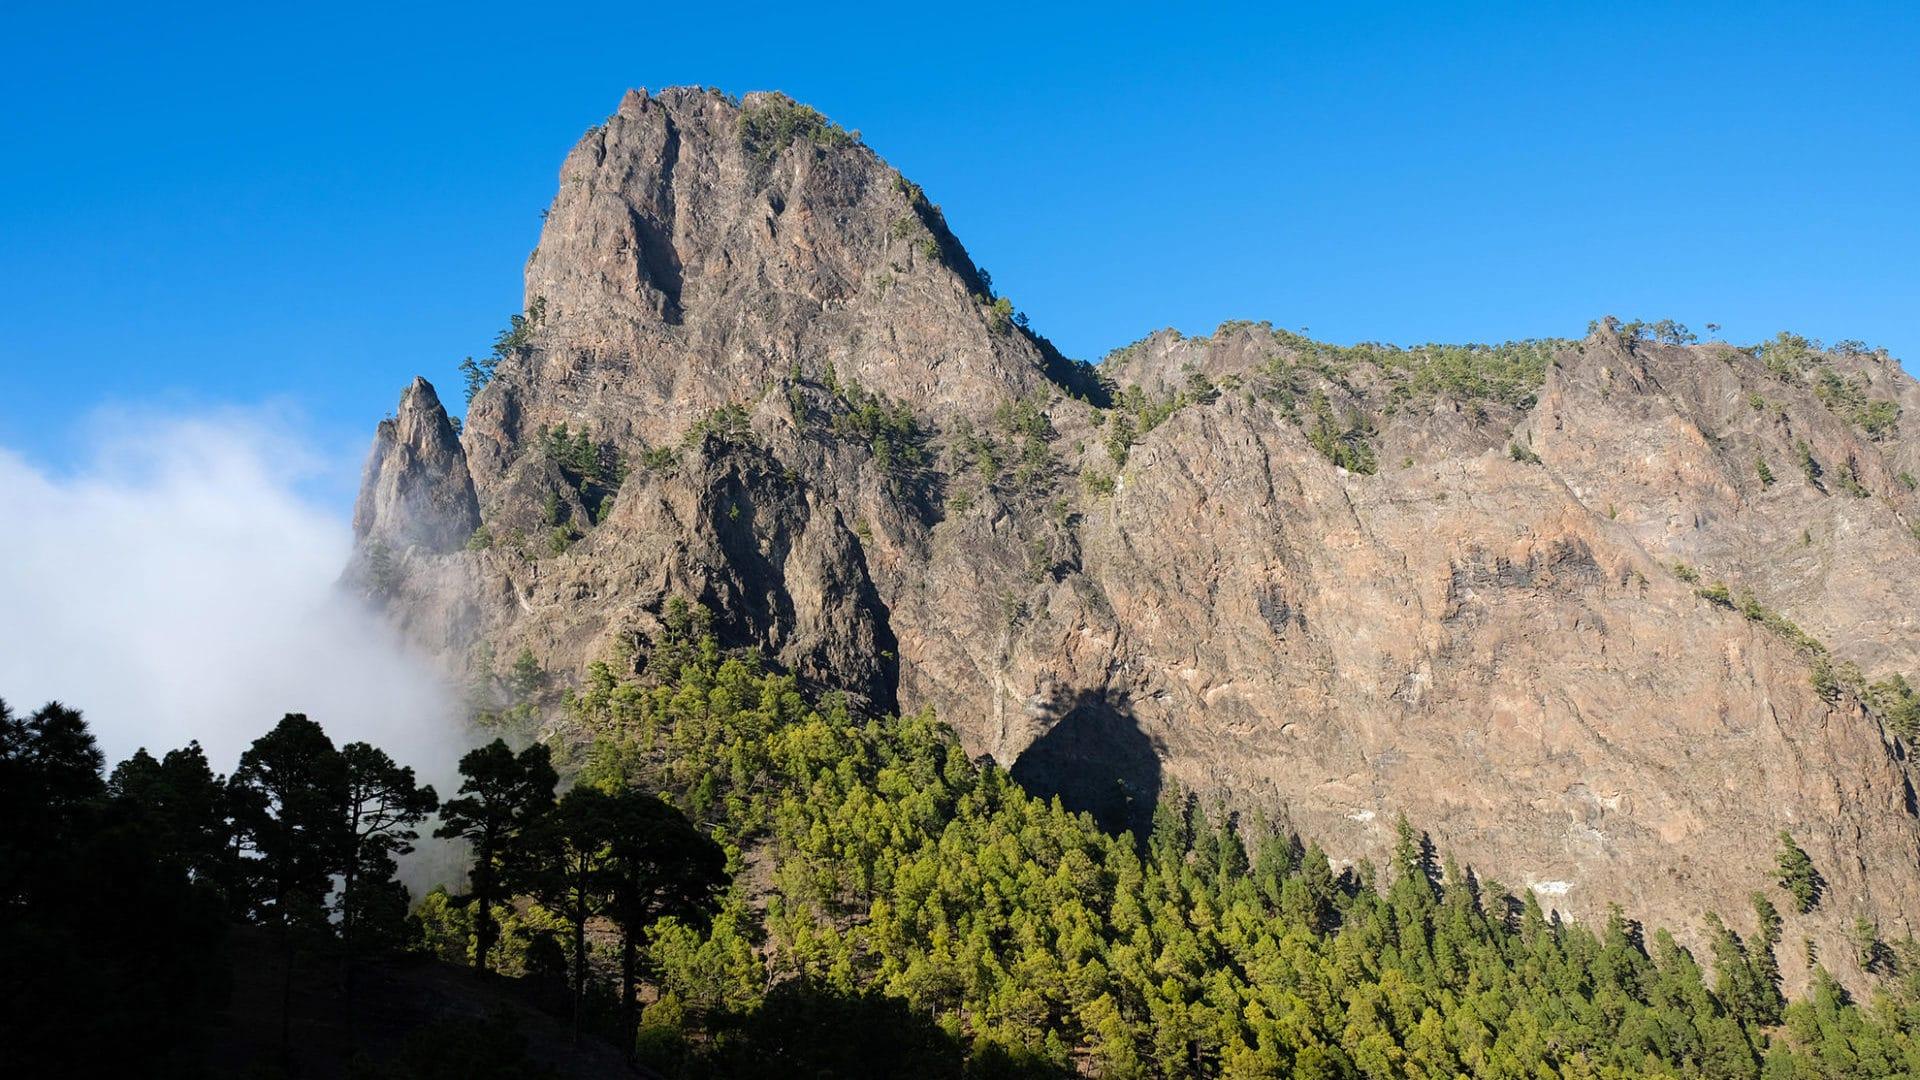 Caldera de Taburiente La Palma Natural Canarie